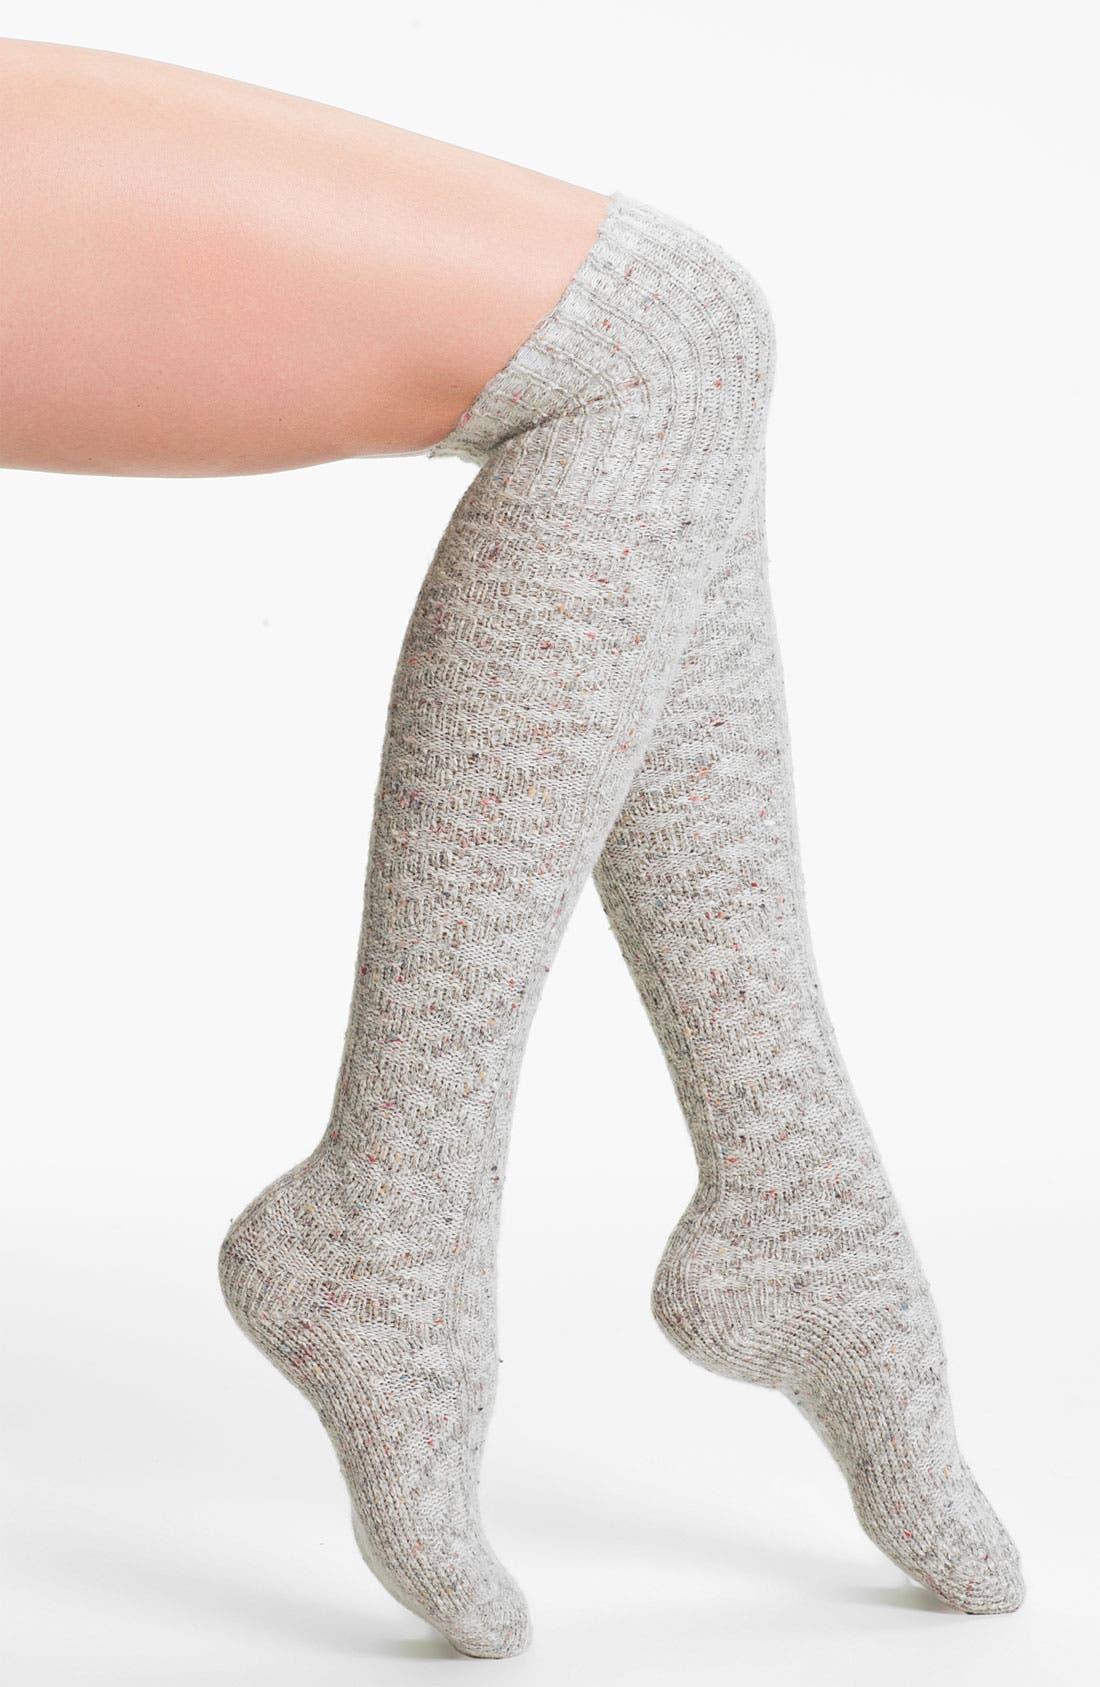 Alternate Image 1 Selected - Free People 'Vintage' Over the Knee Socks